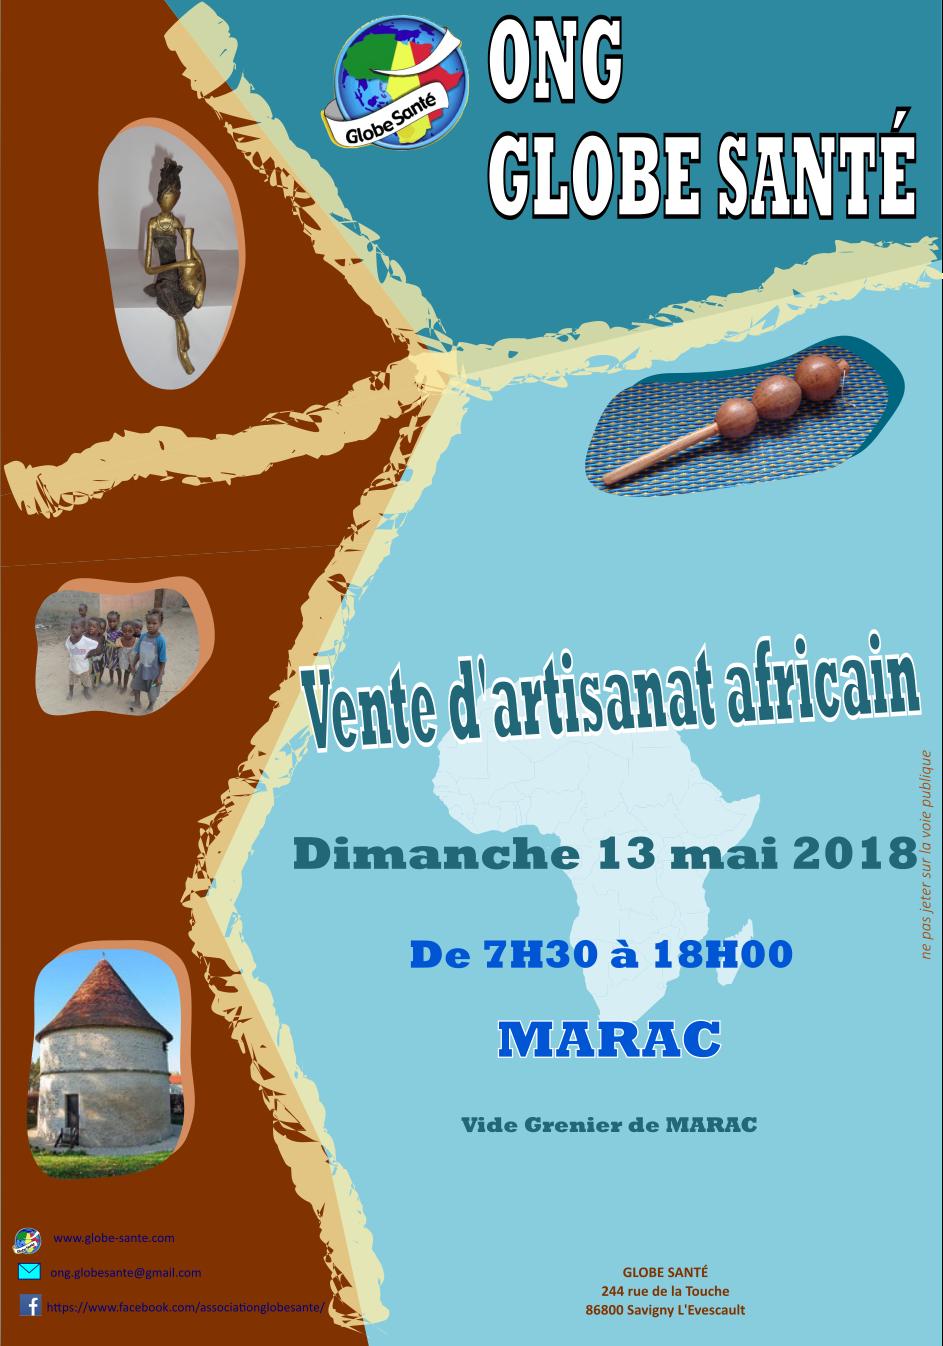 Vente d'artisanat africain à MARAC